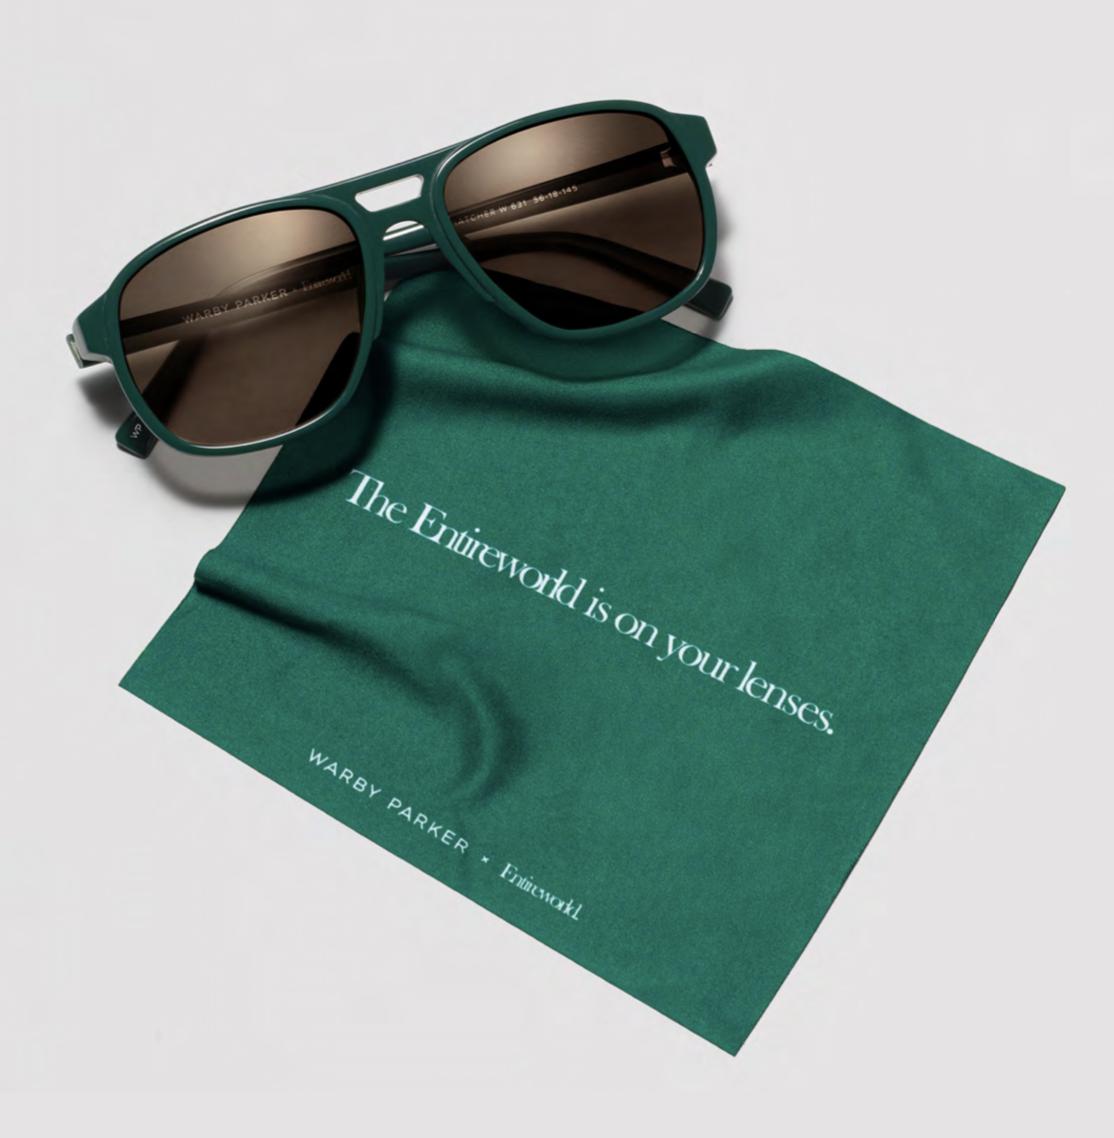 Entireworld x Warby Parker Sunglasses